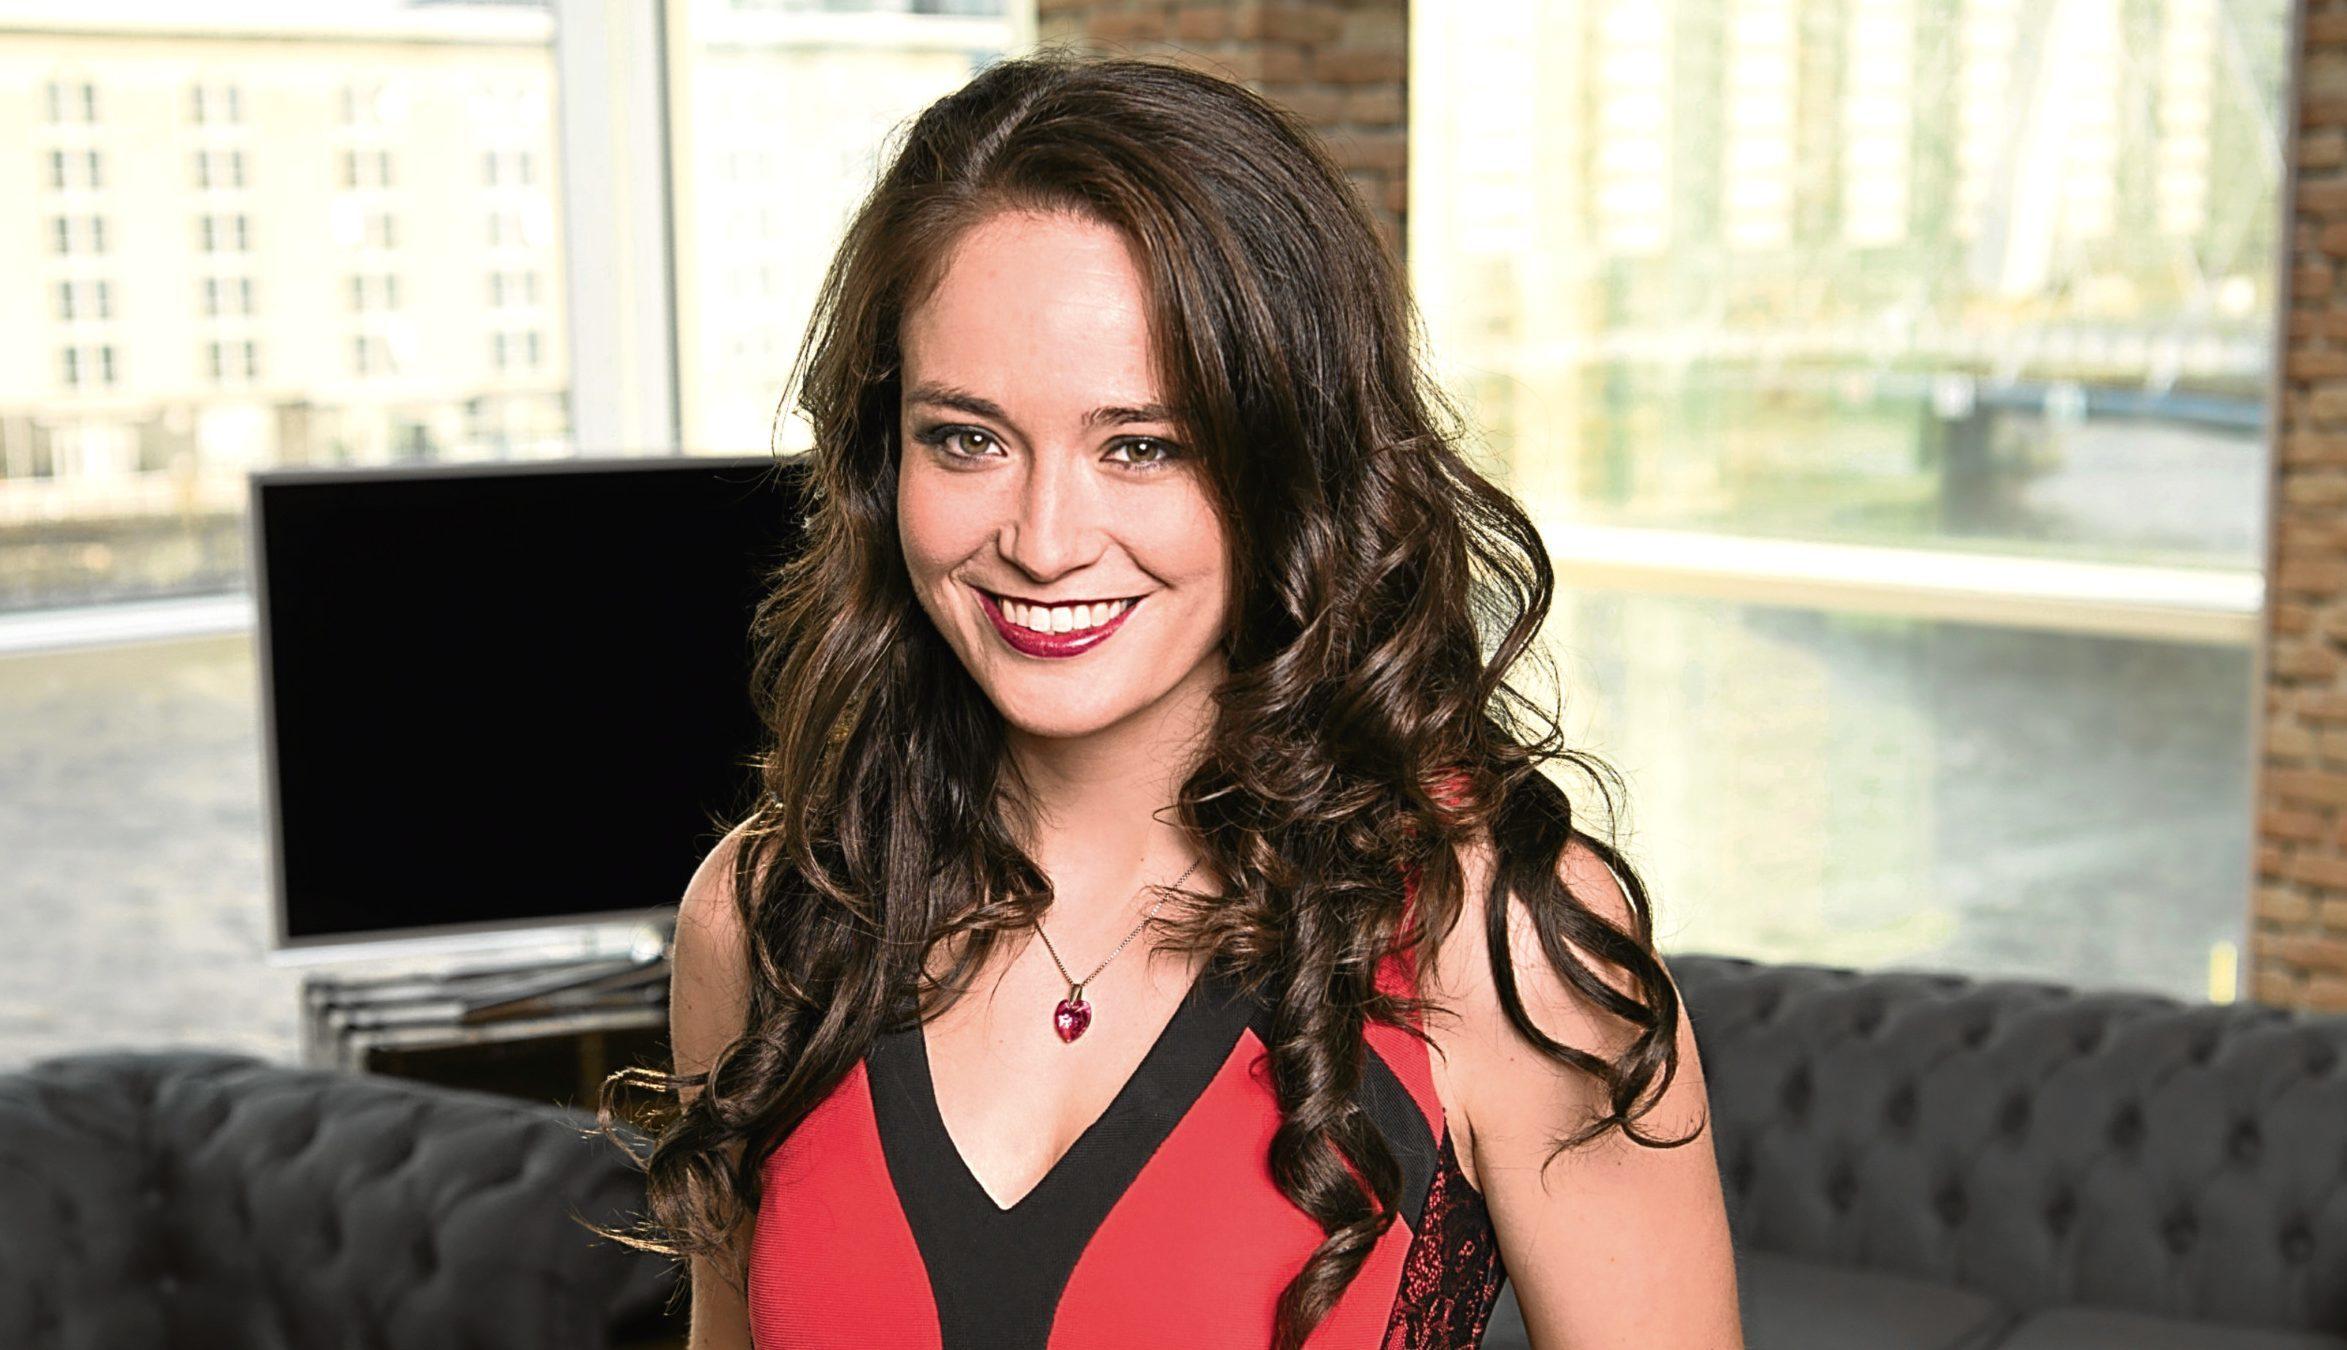 STV presenter Jennifer Reoch (Graeme Hunter/ STV)